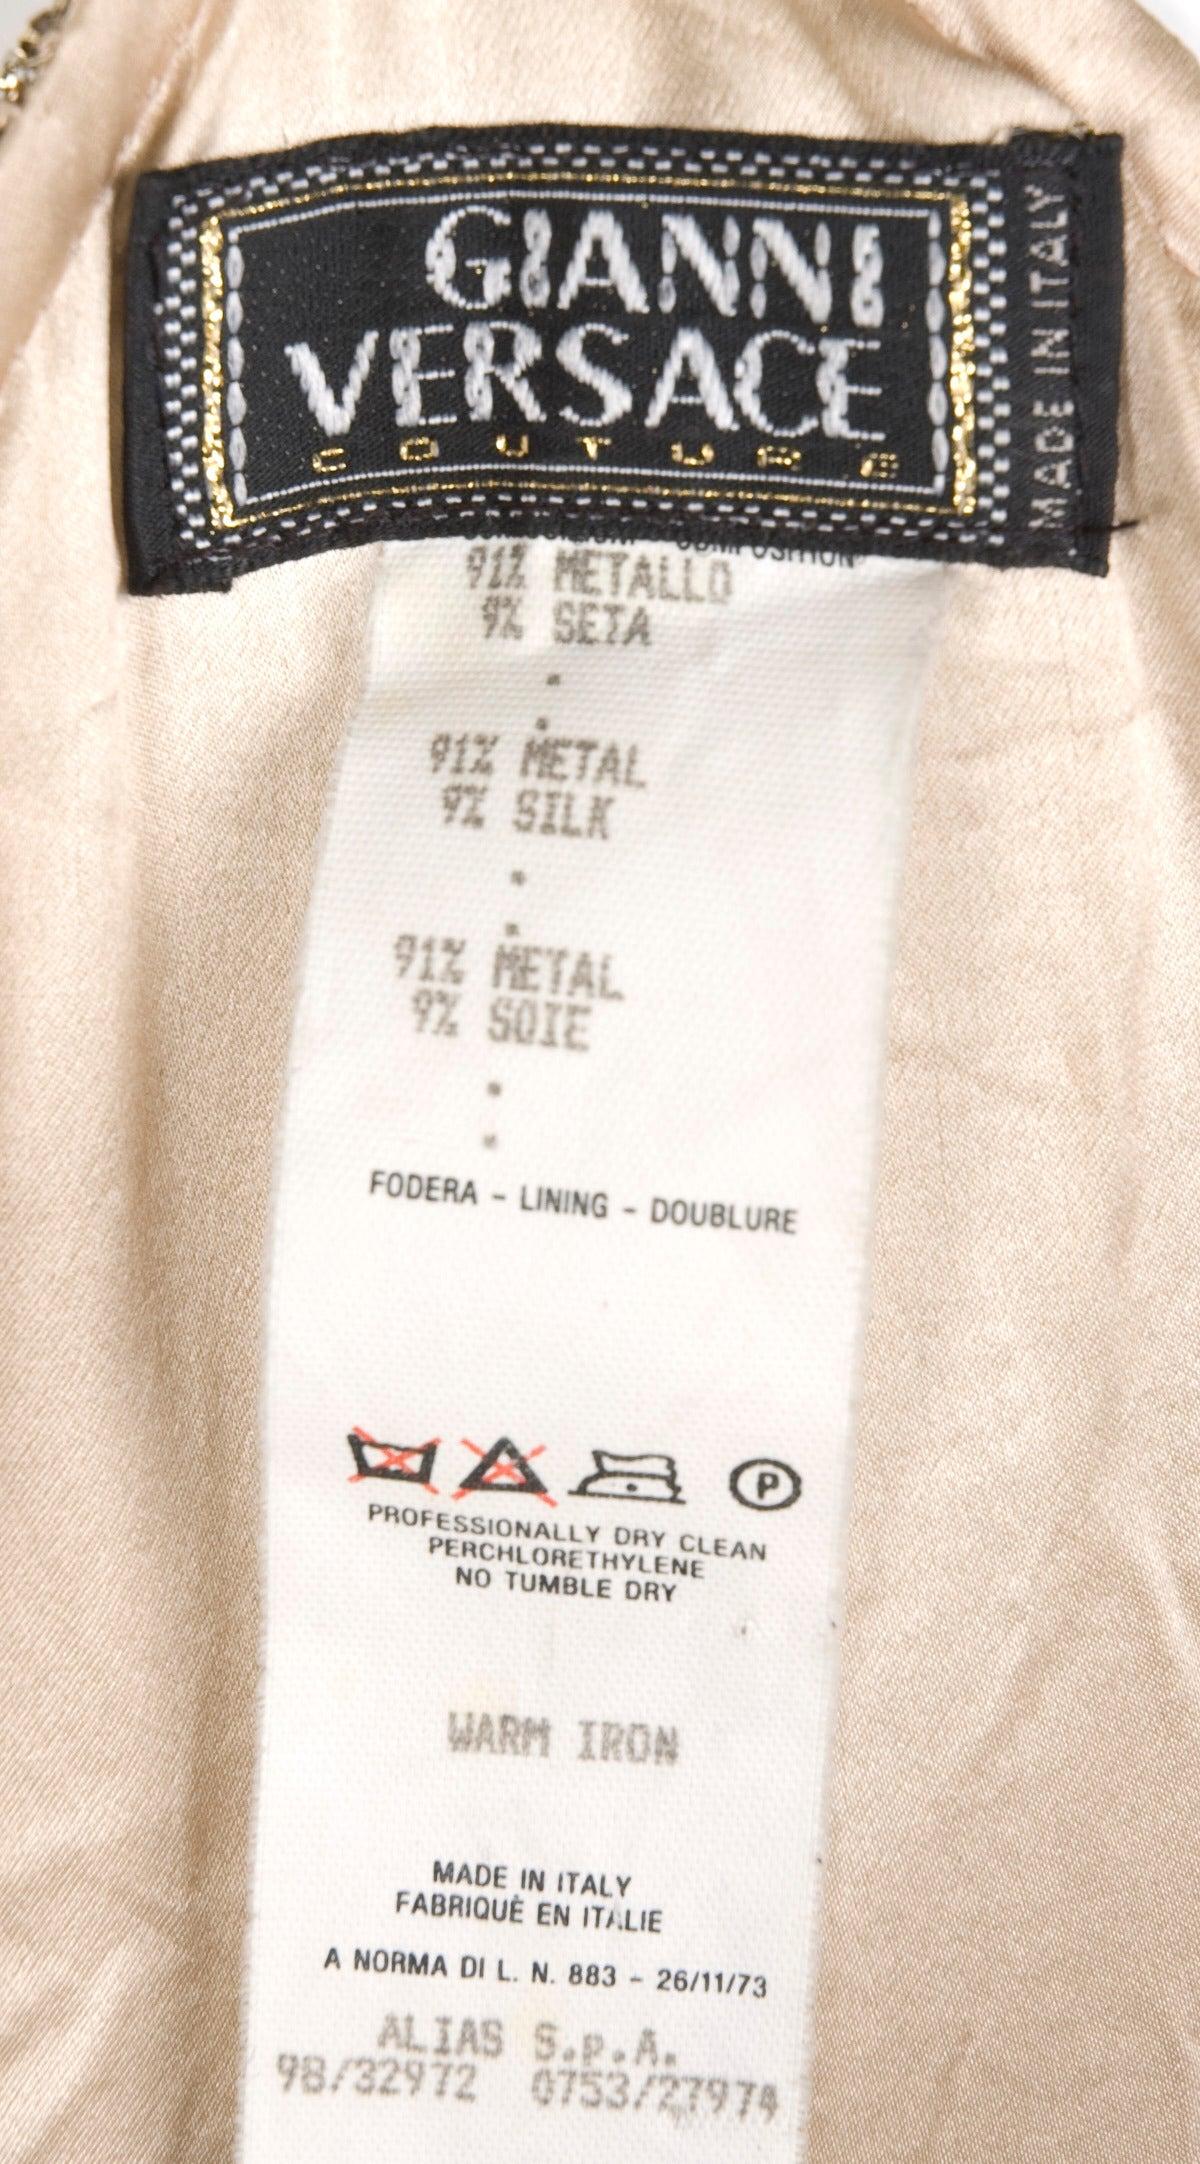 1982 Gianni Versace Couture Metal Mesh Oroton Top and Skirt 8